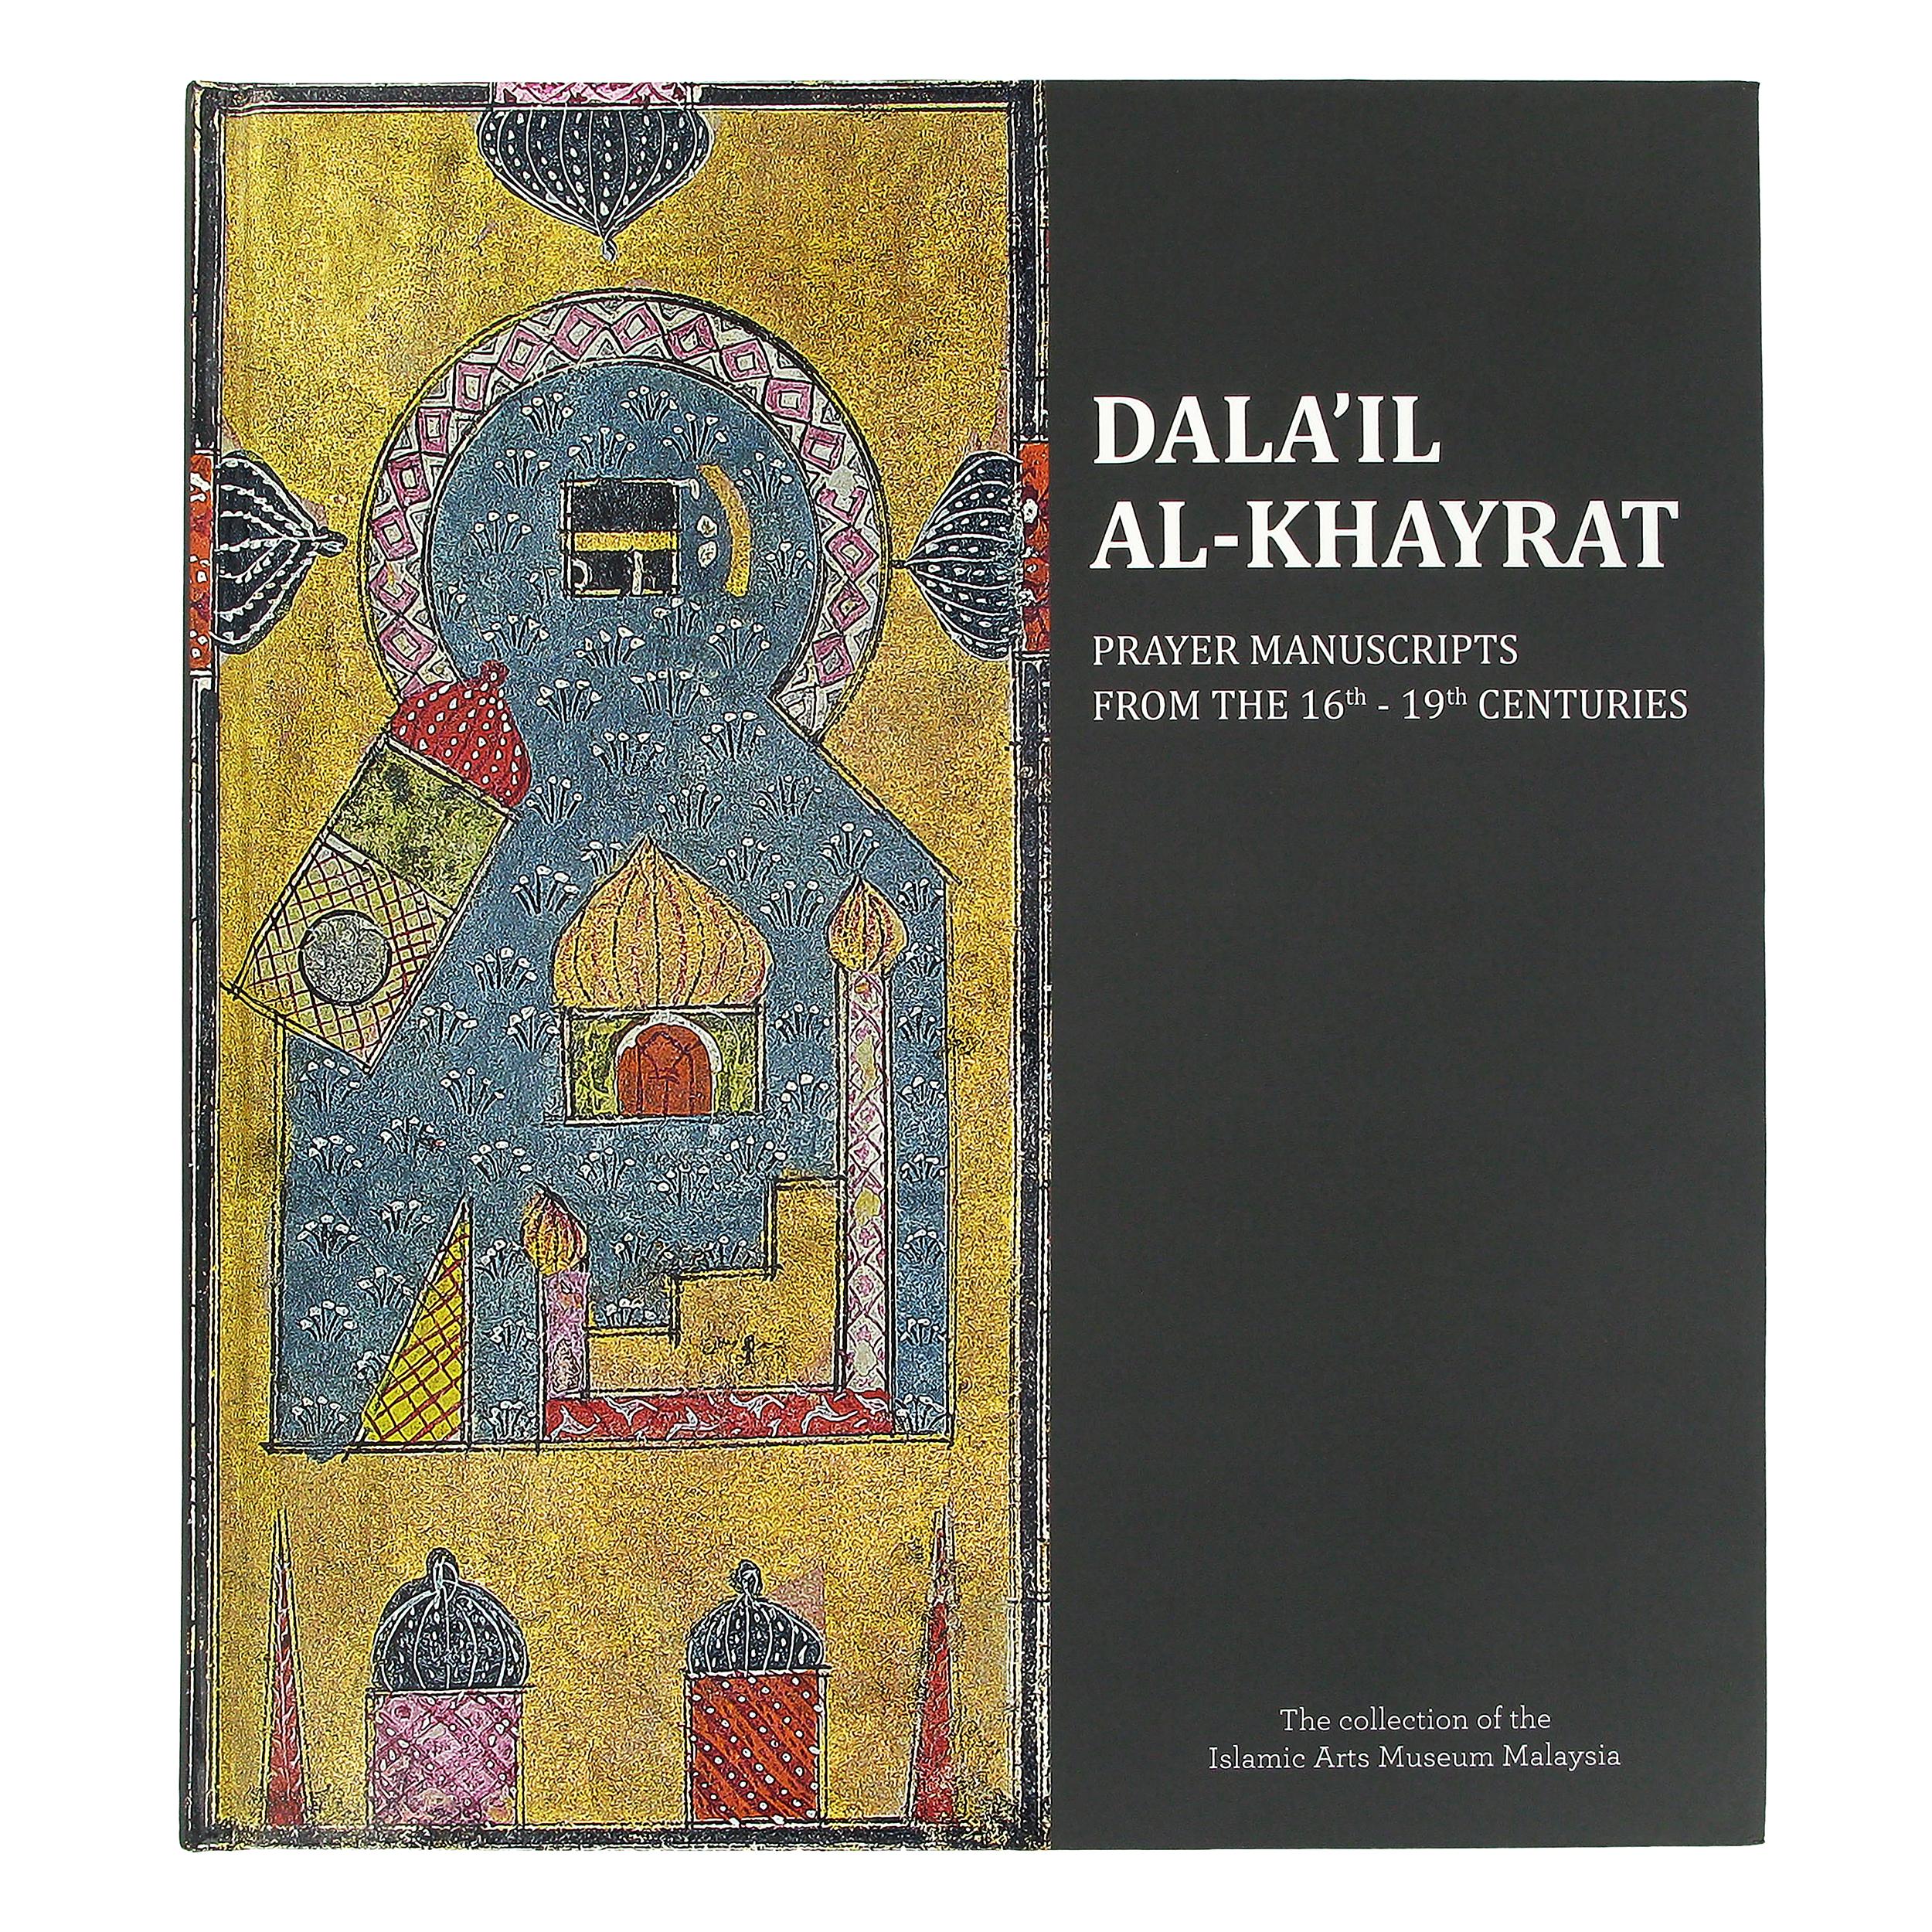 Dala'il al-Khayrat: Prayer Manuscripts From The 16th To 19th Centuries